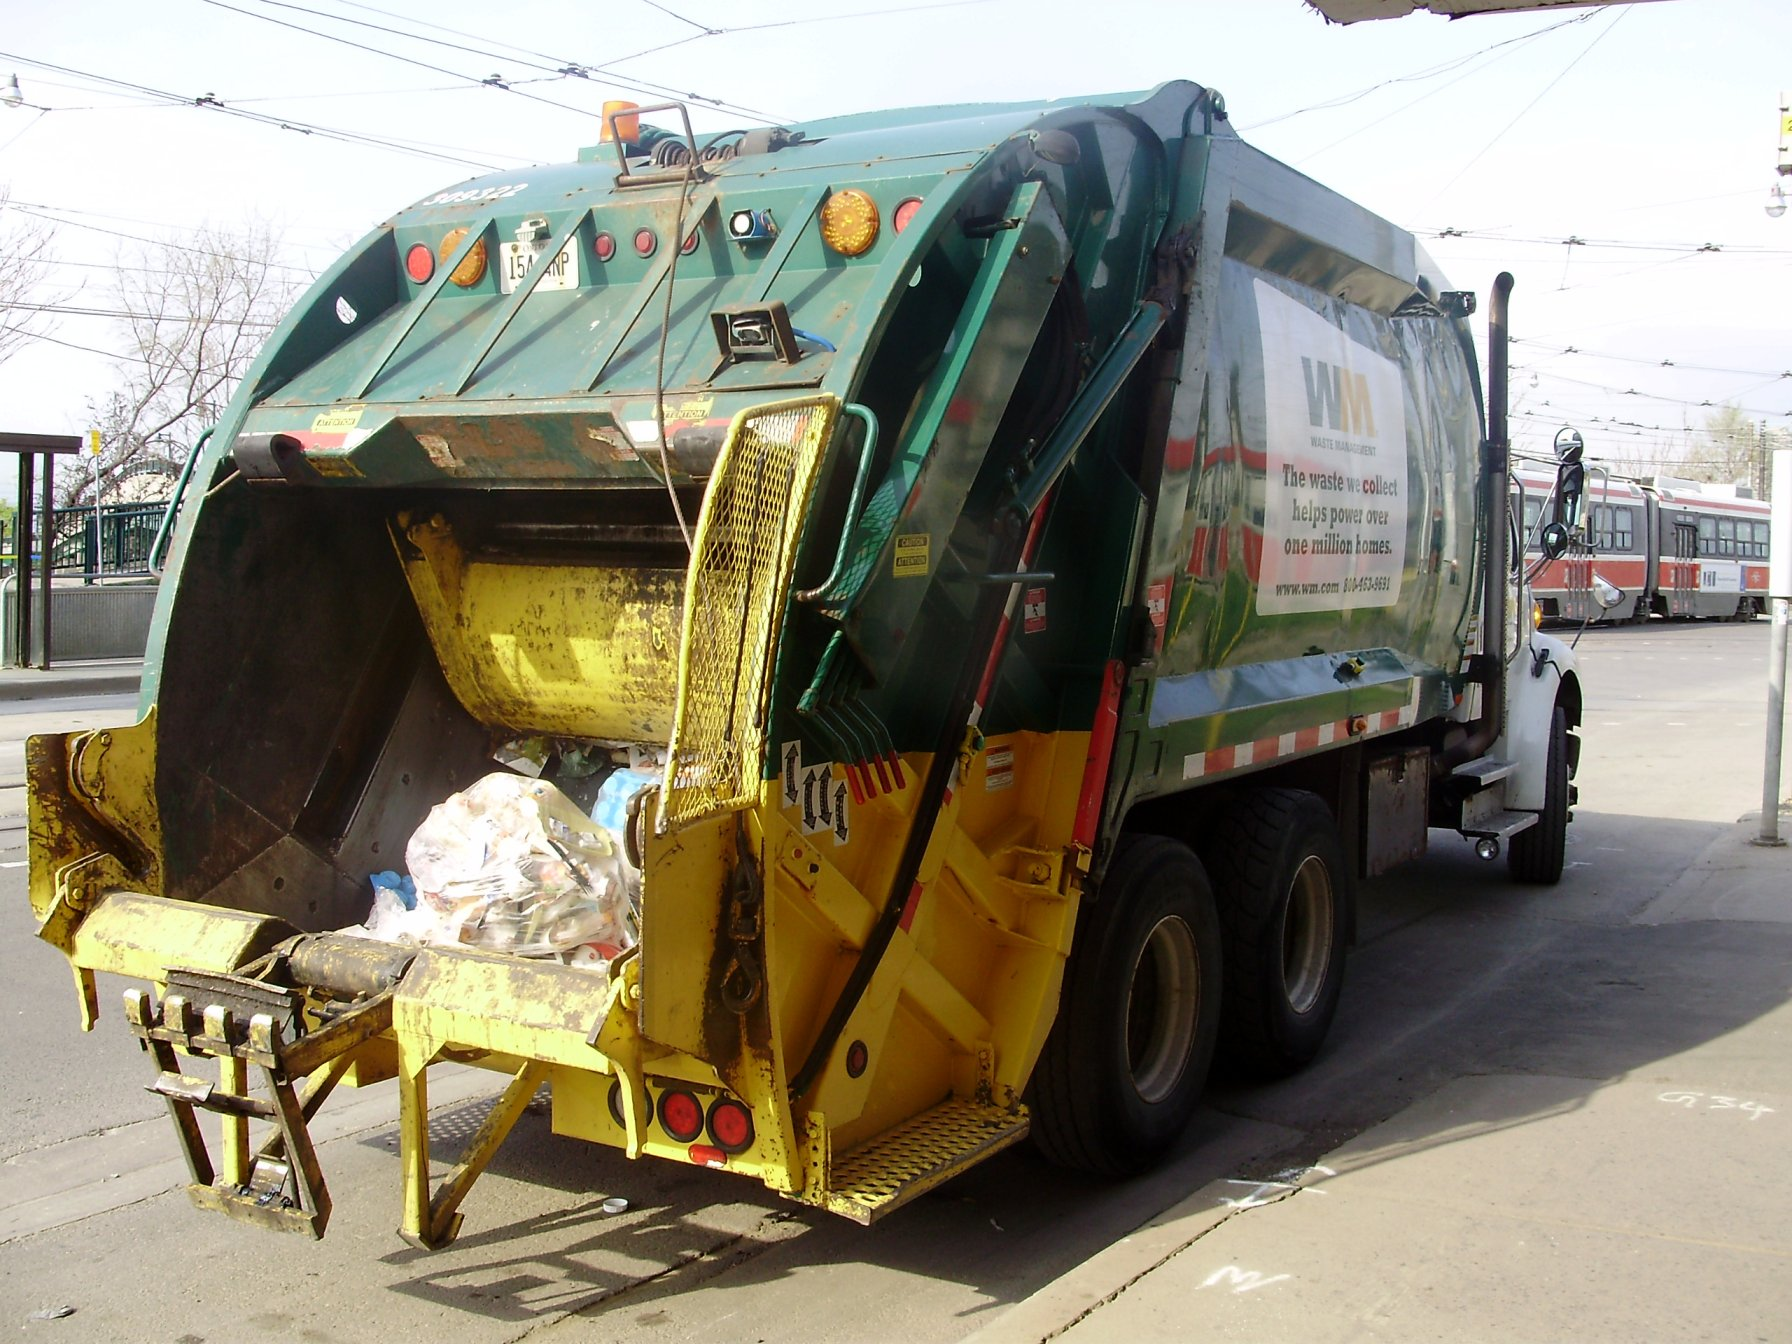 Description waste management truck toronto